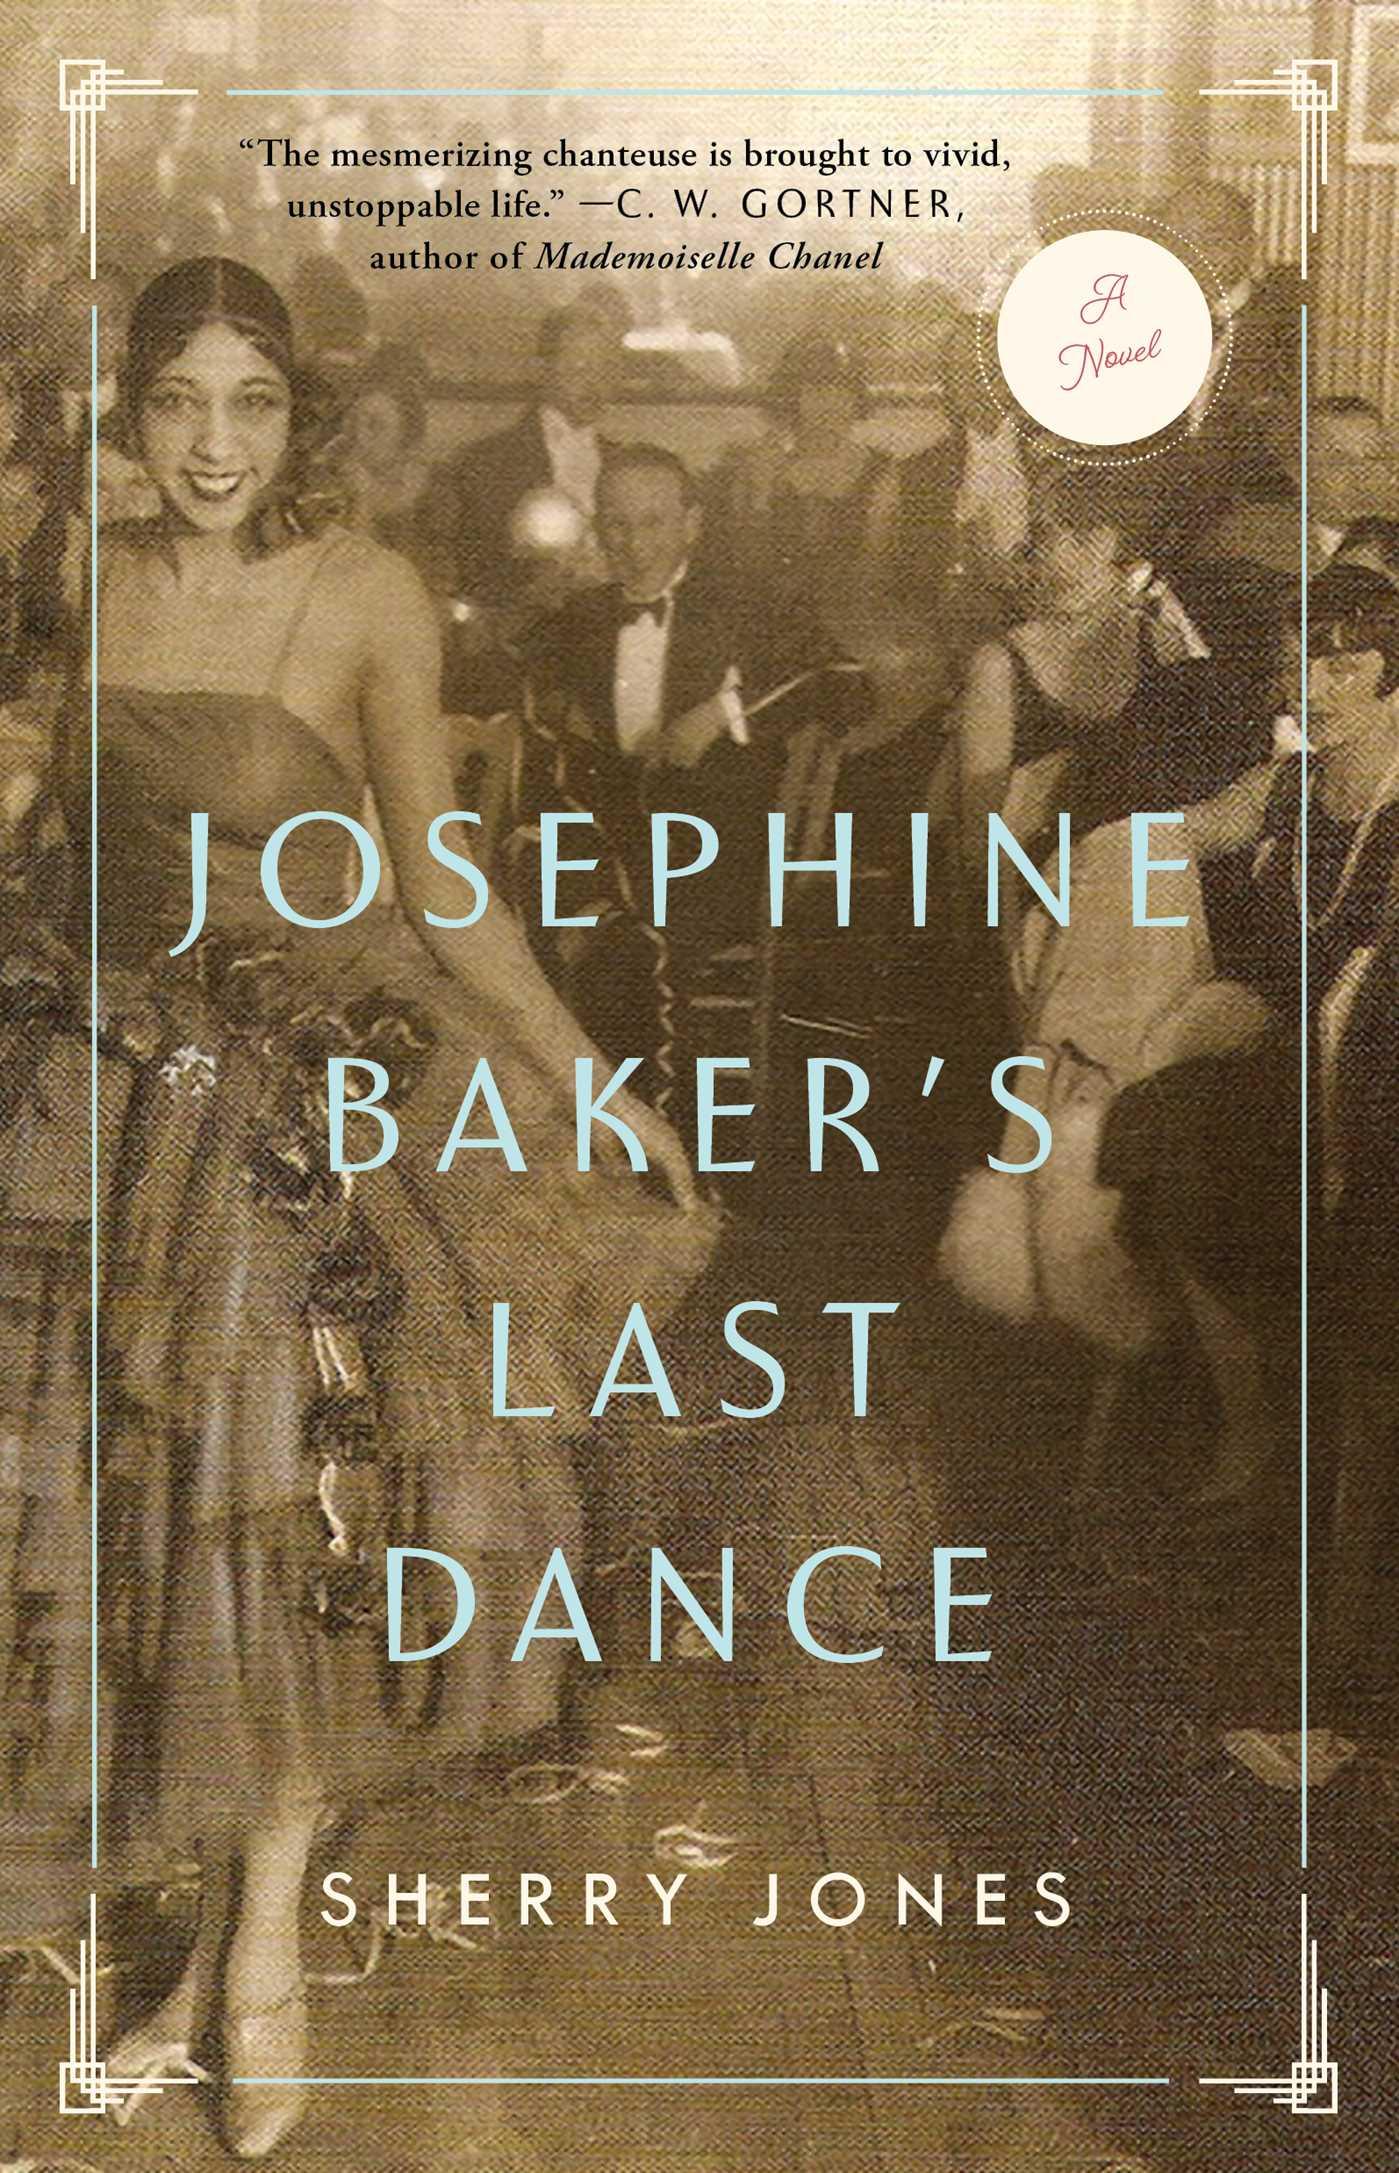 Josephine bakers last dance 9781501102448 hr